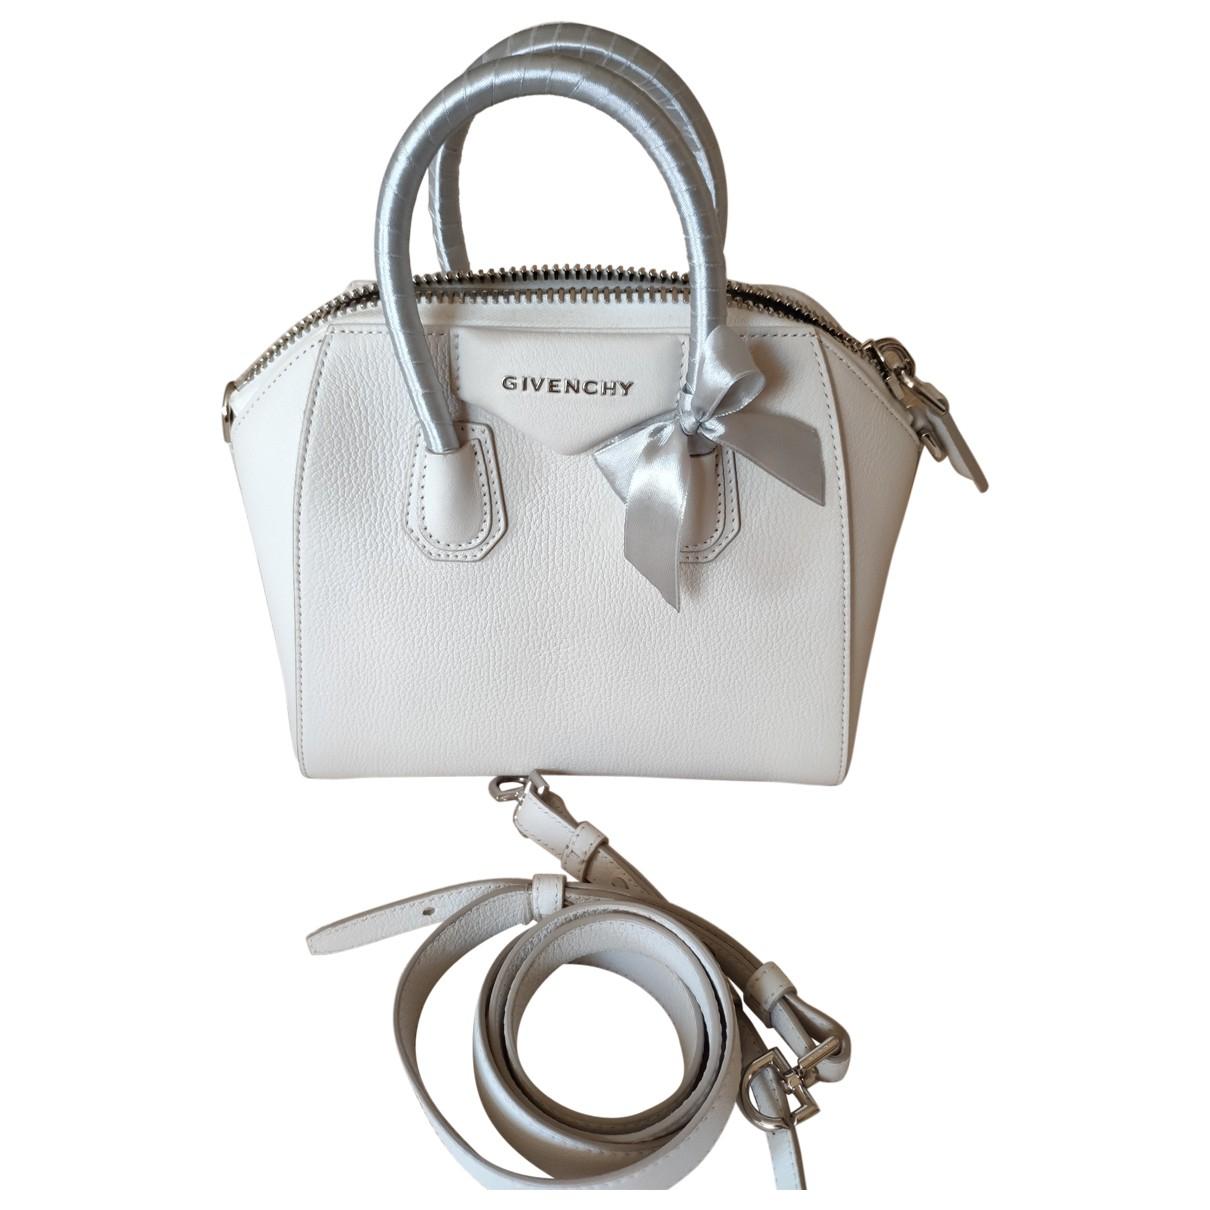 Givenchy - Sac a main Antigona pour femme en cuir - blanc